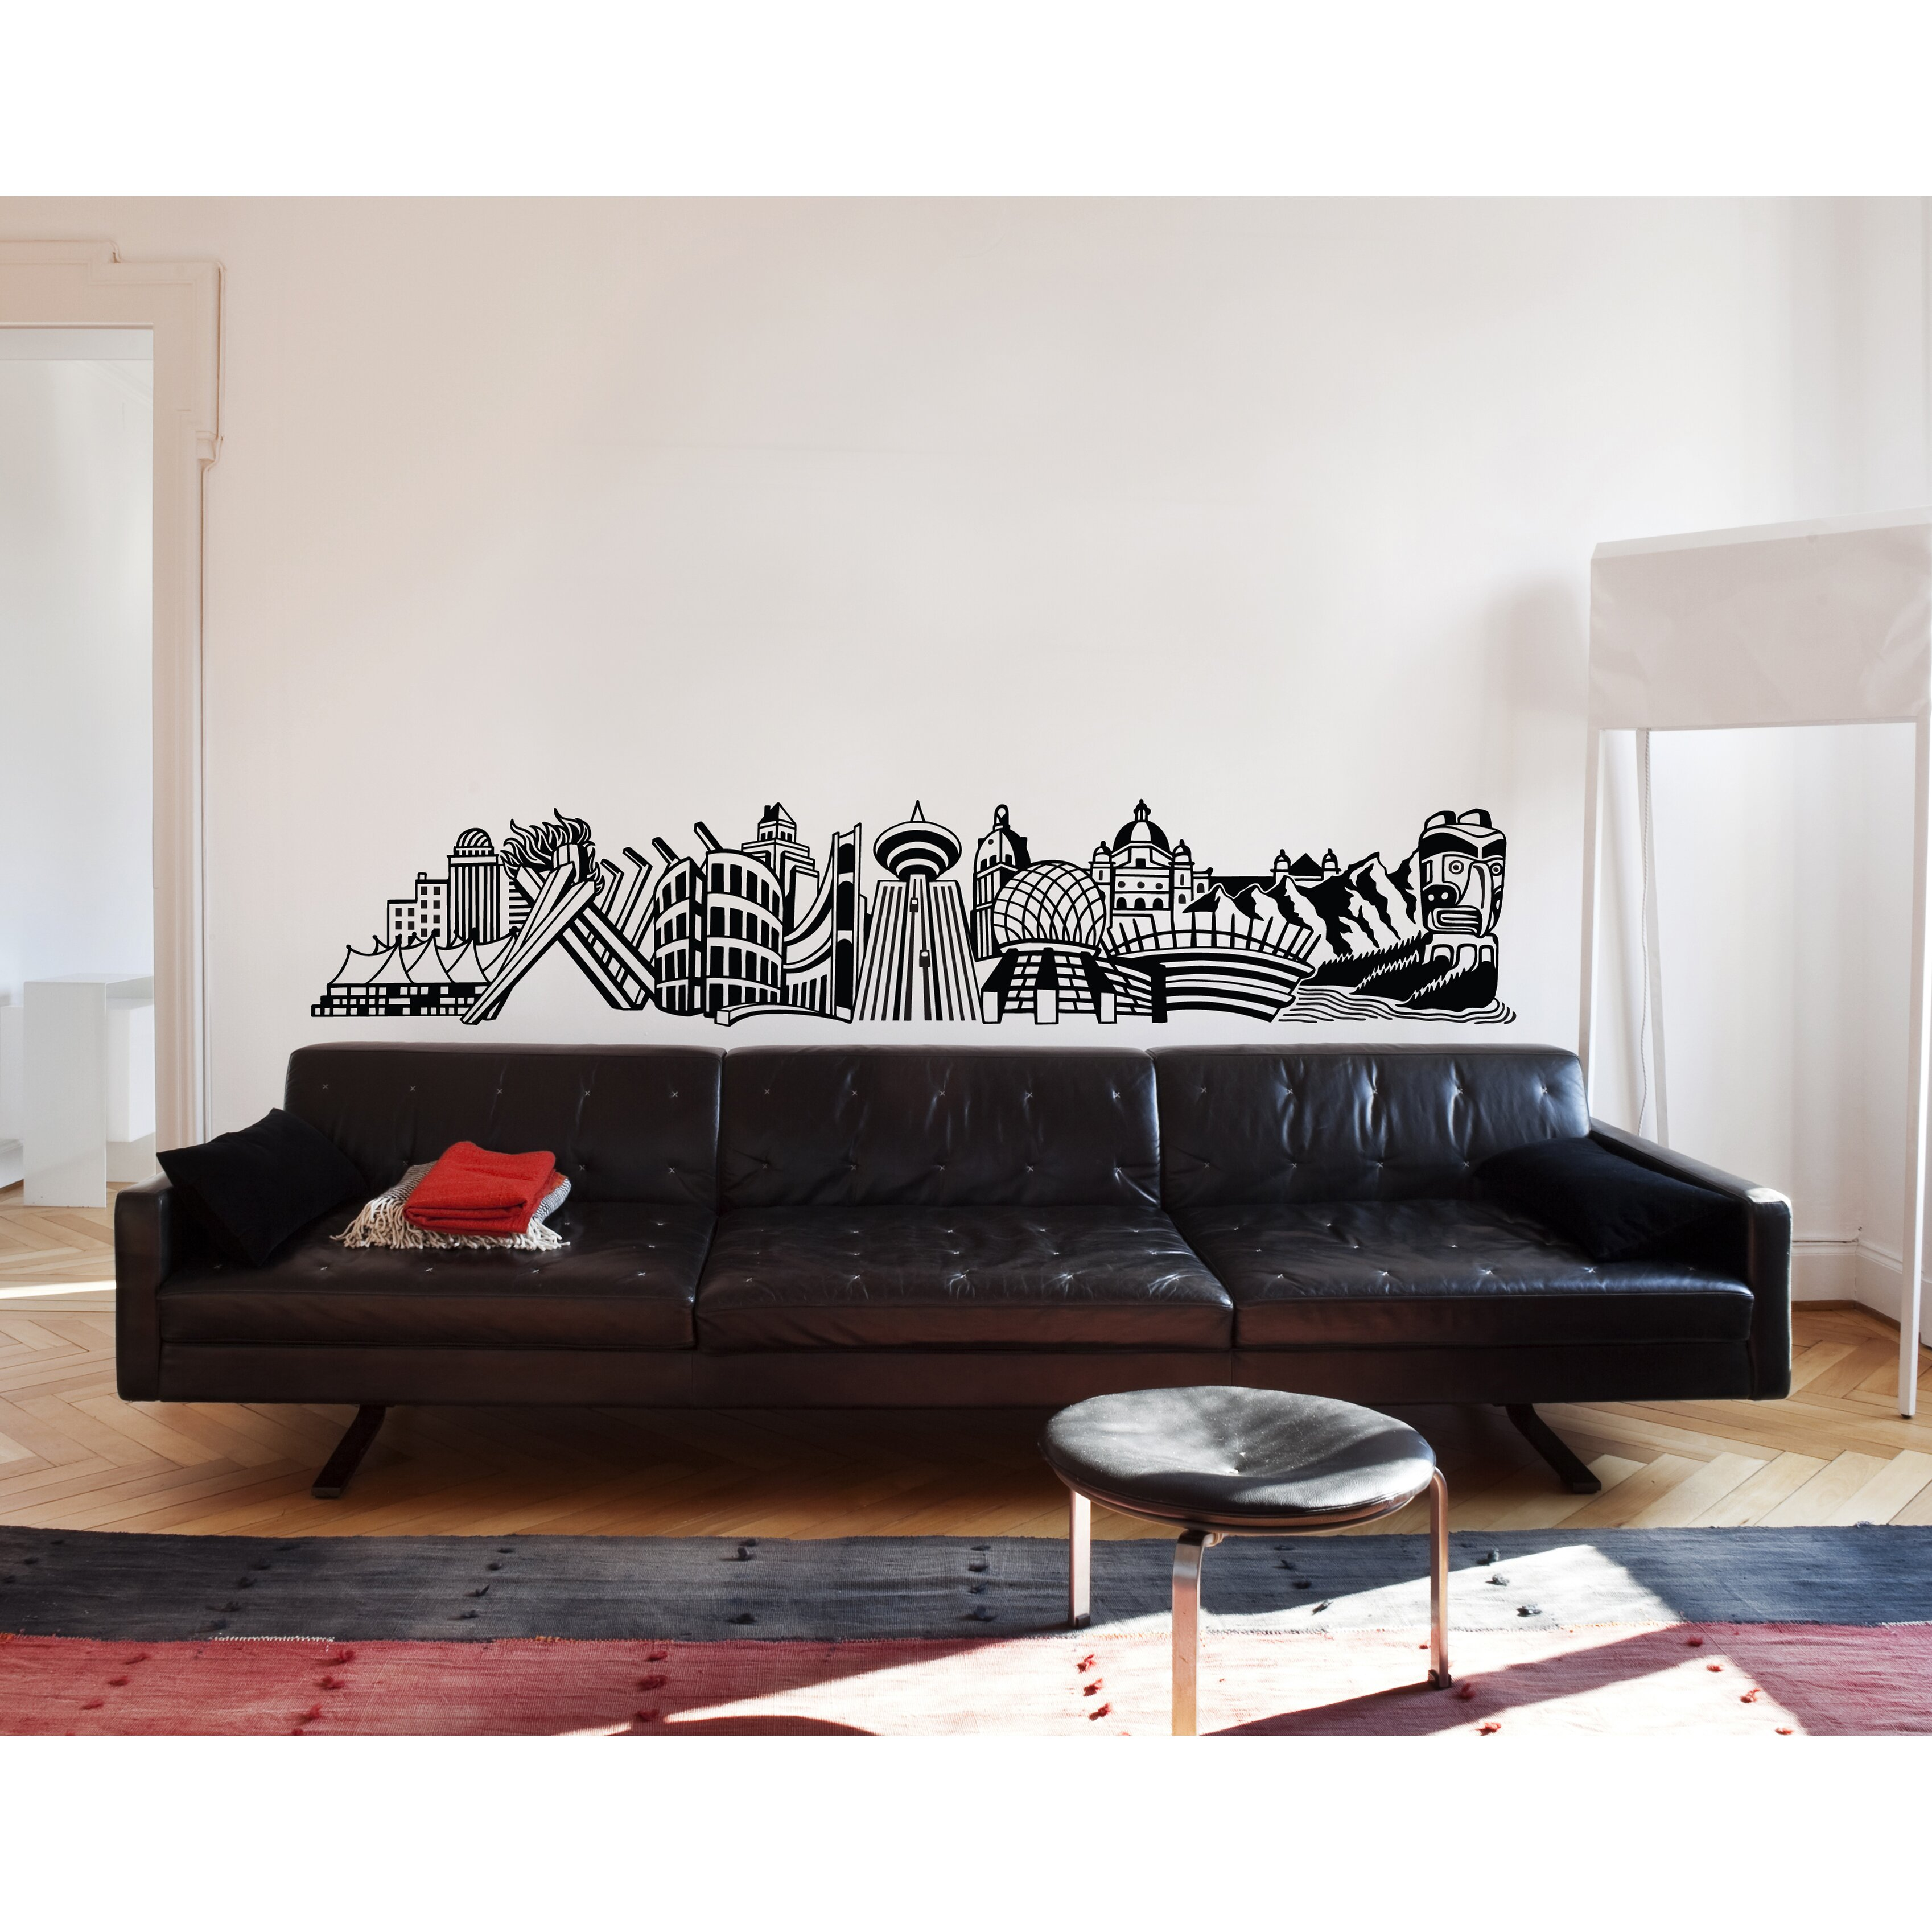 Adzif xxl into vancouver wall mural wayfair for Decor mural xxl